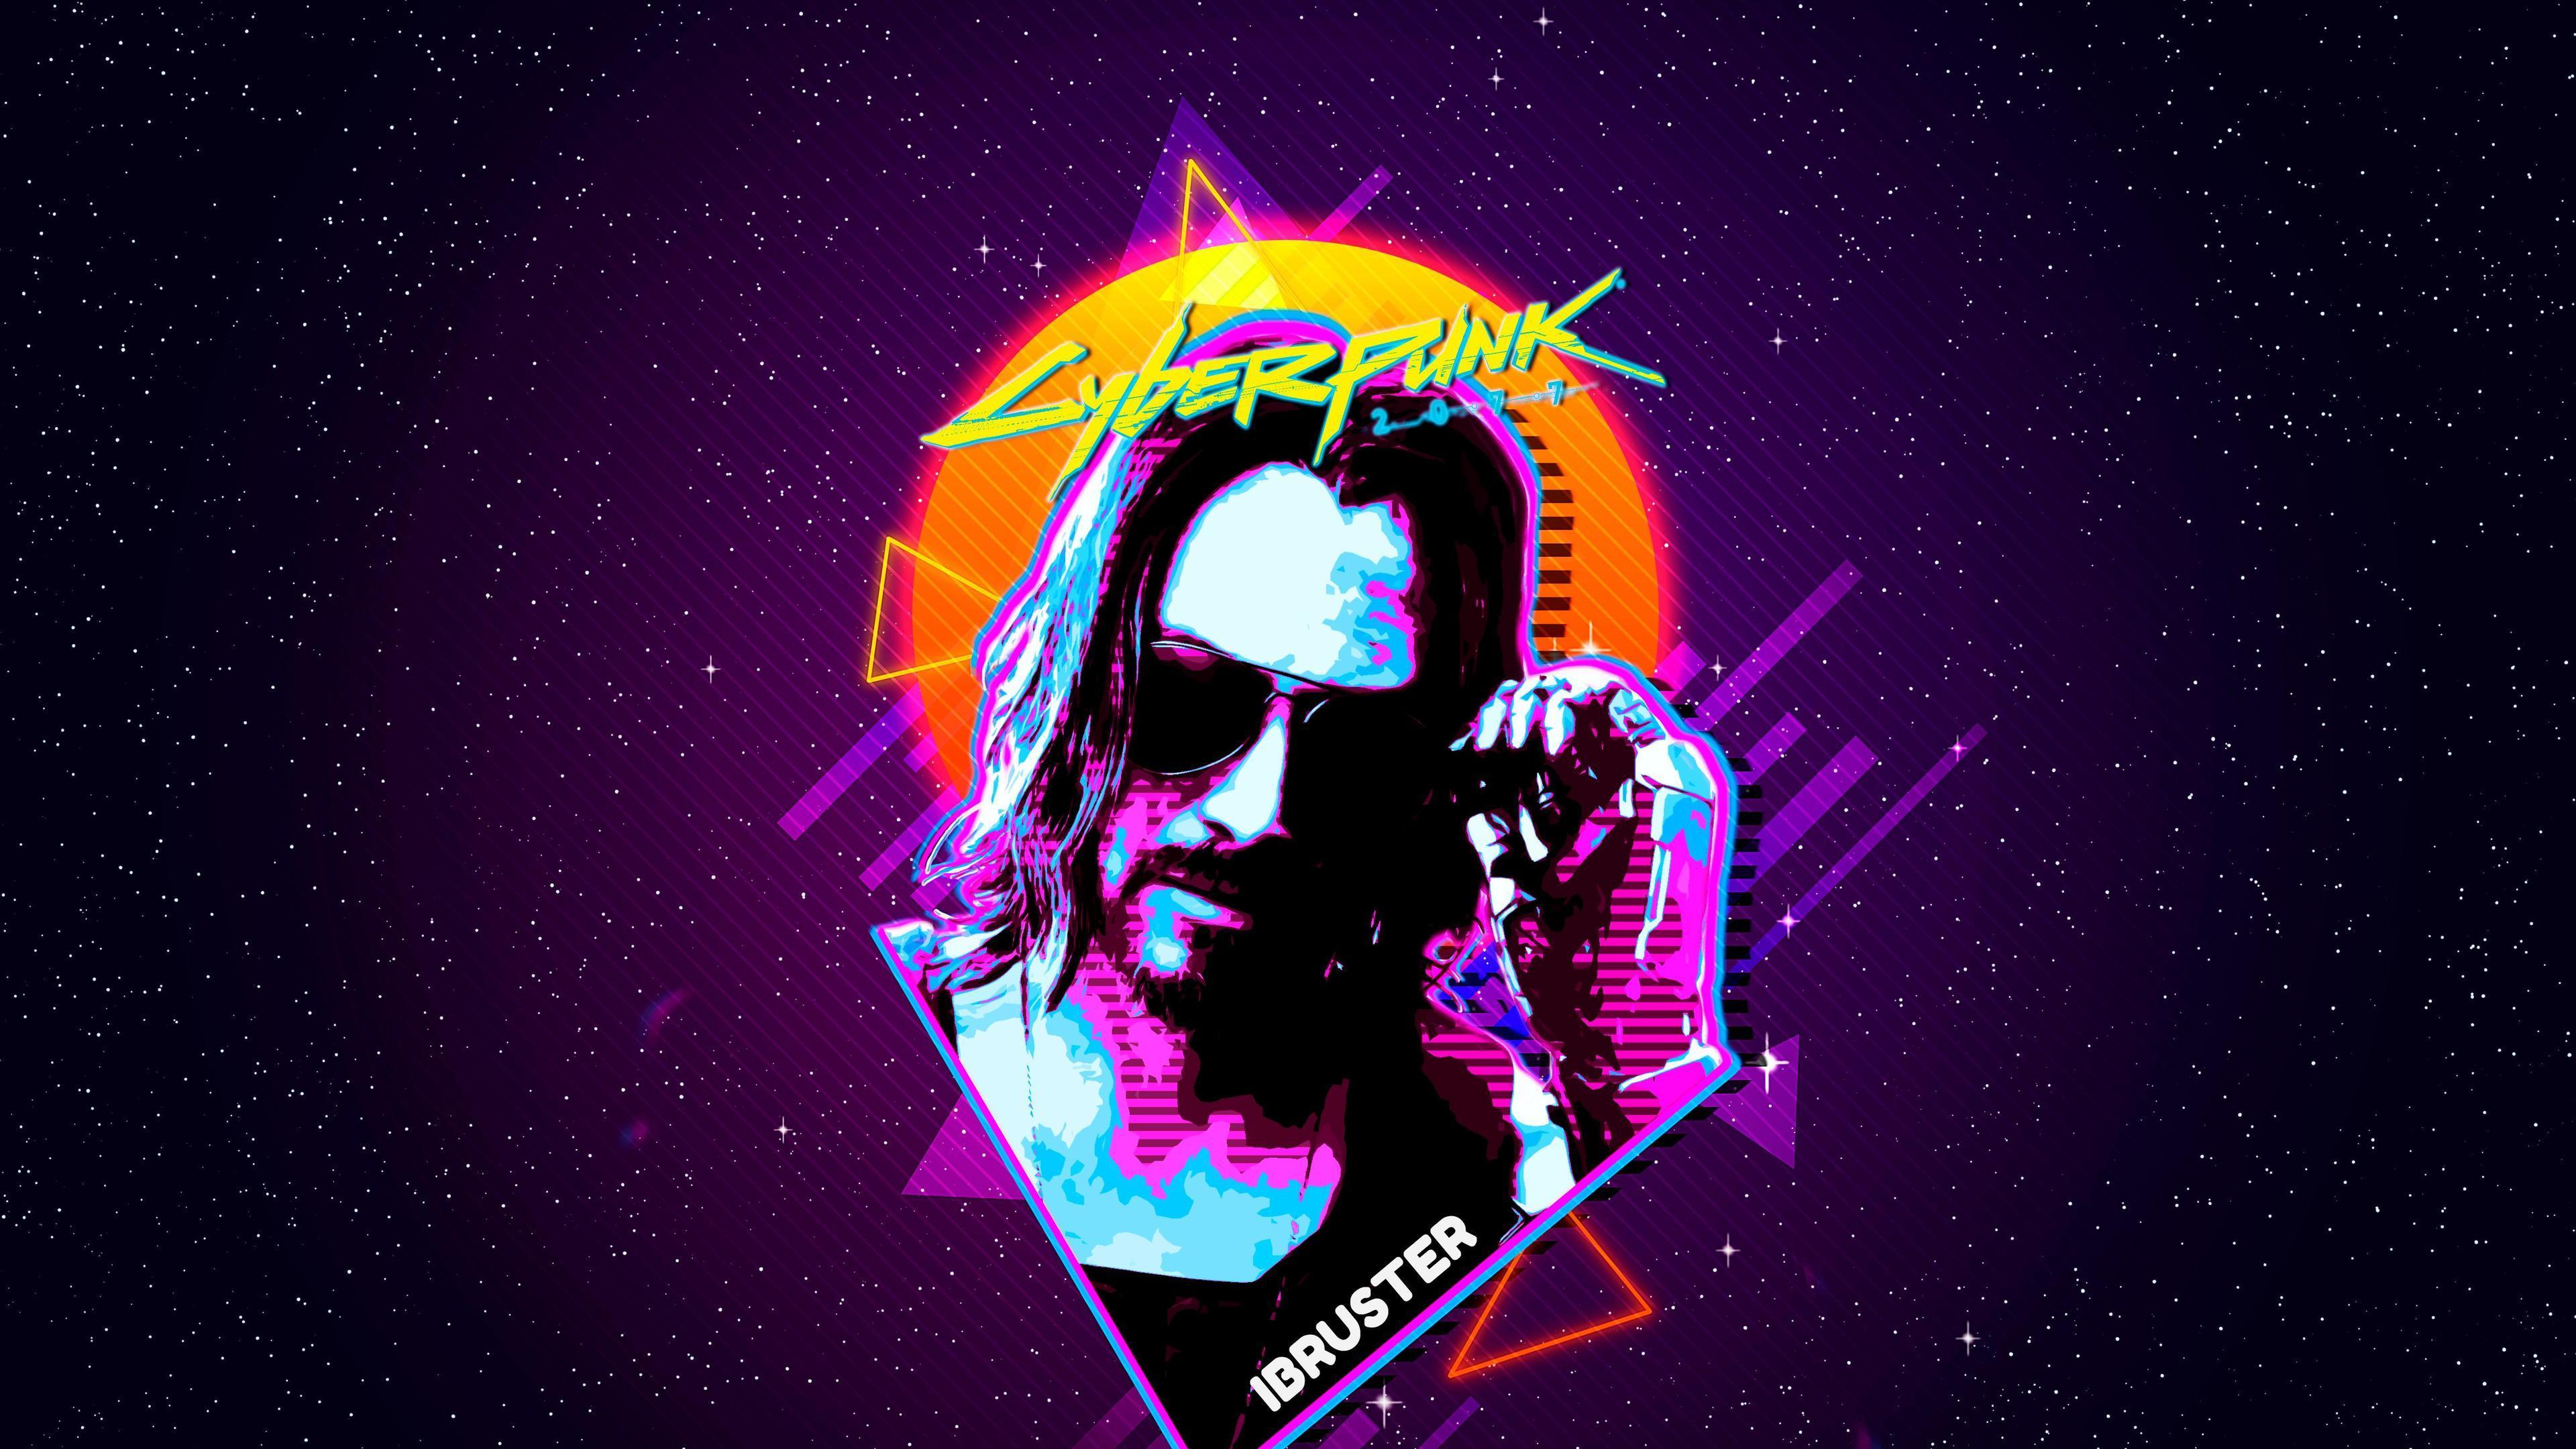 3840x2160 Hình nền 4k Keanu Reeves Cyberpunk 2077 Hình nền 4k Retro